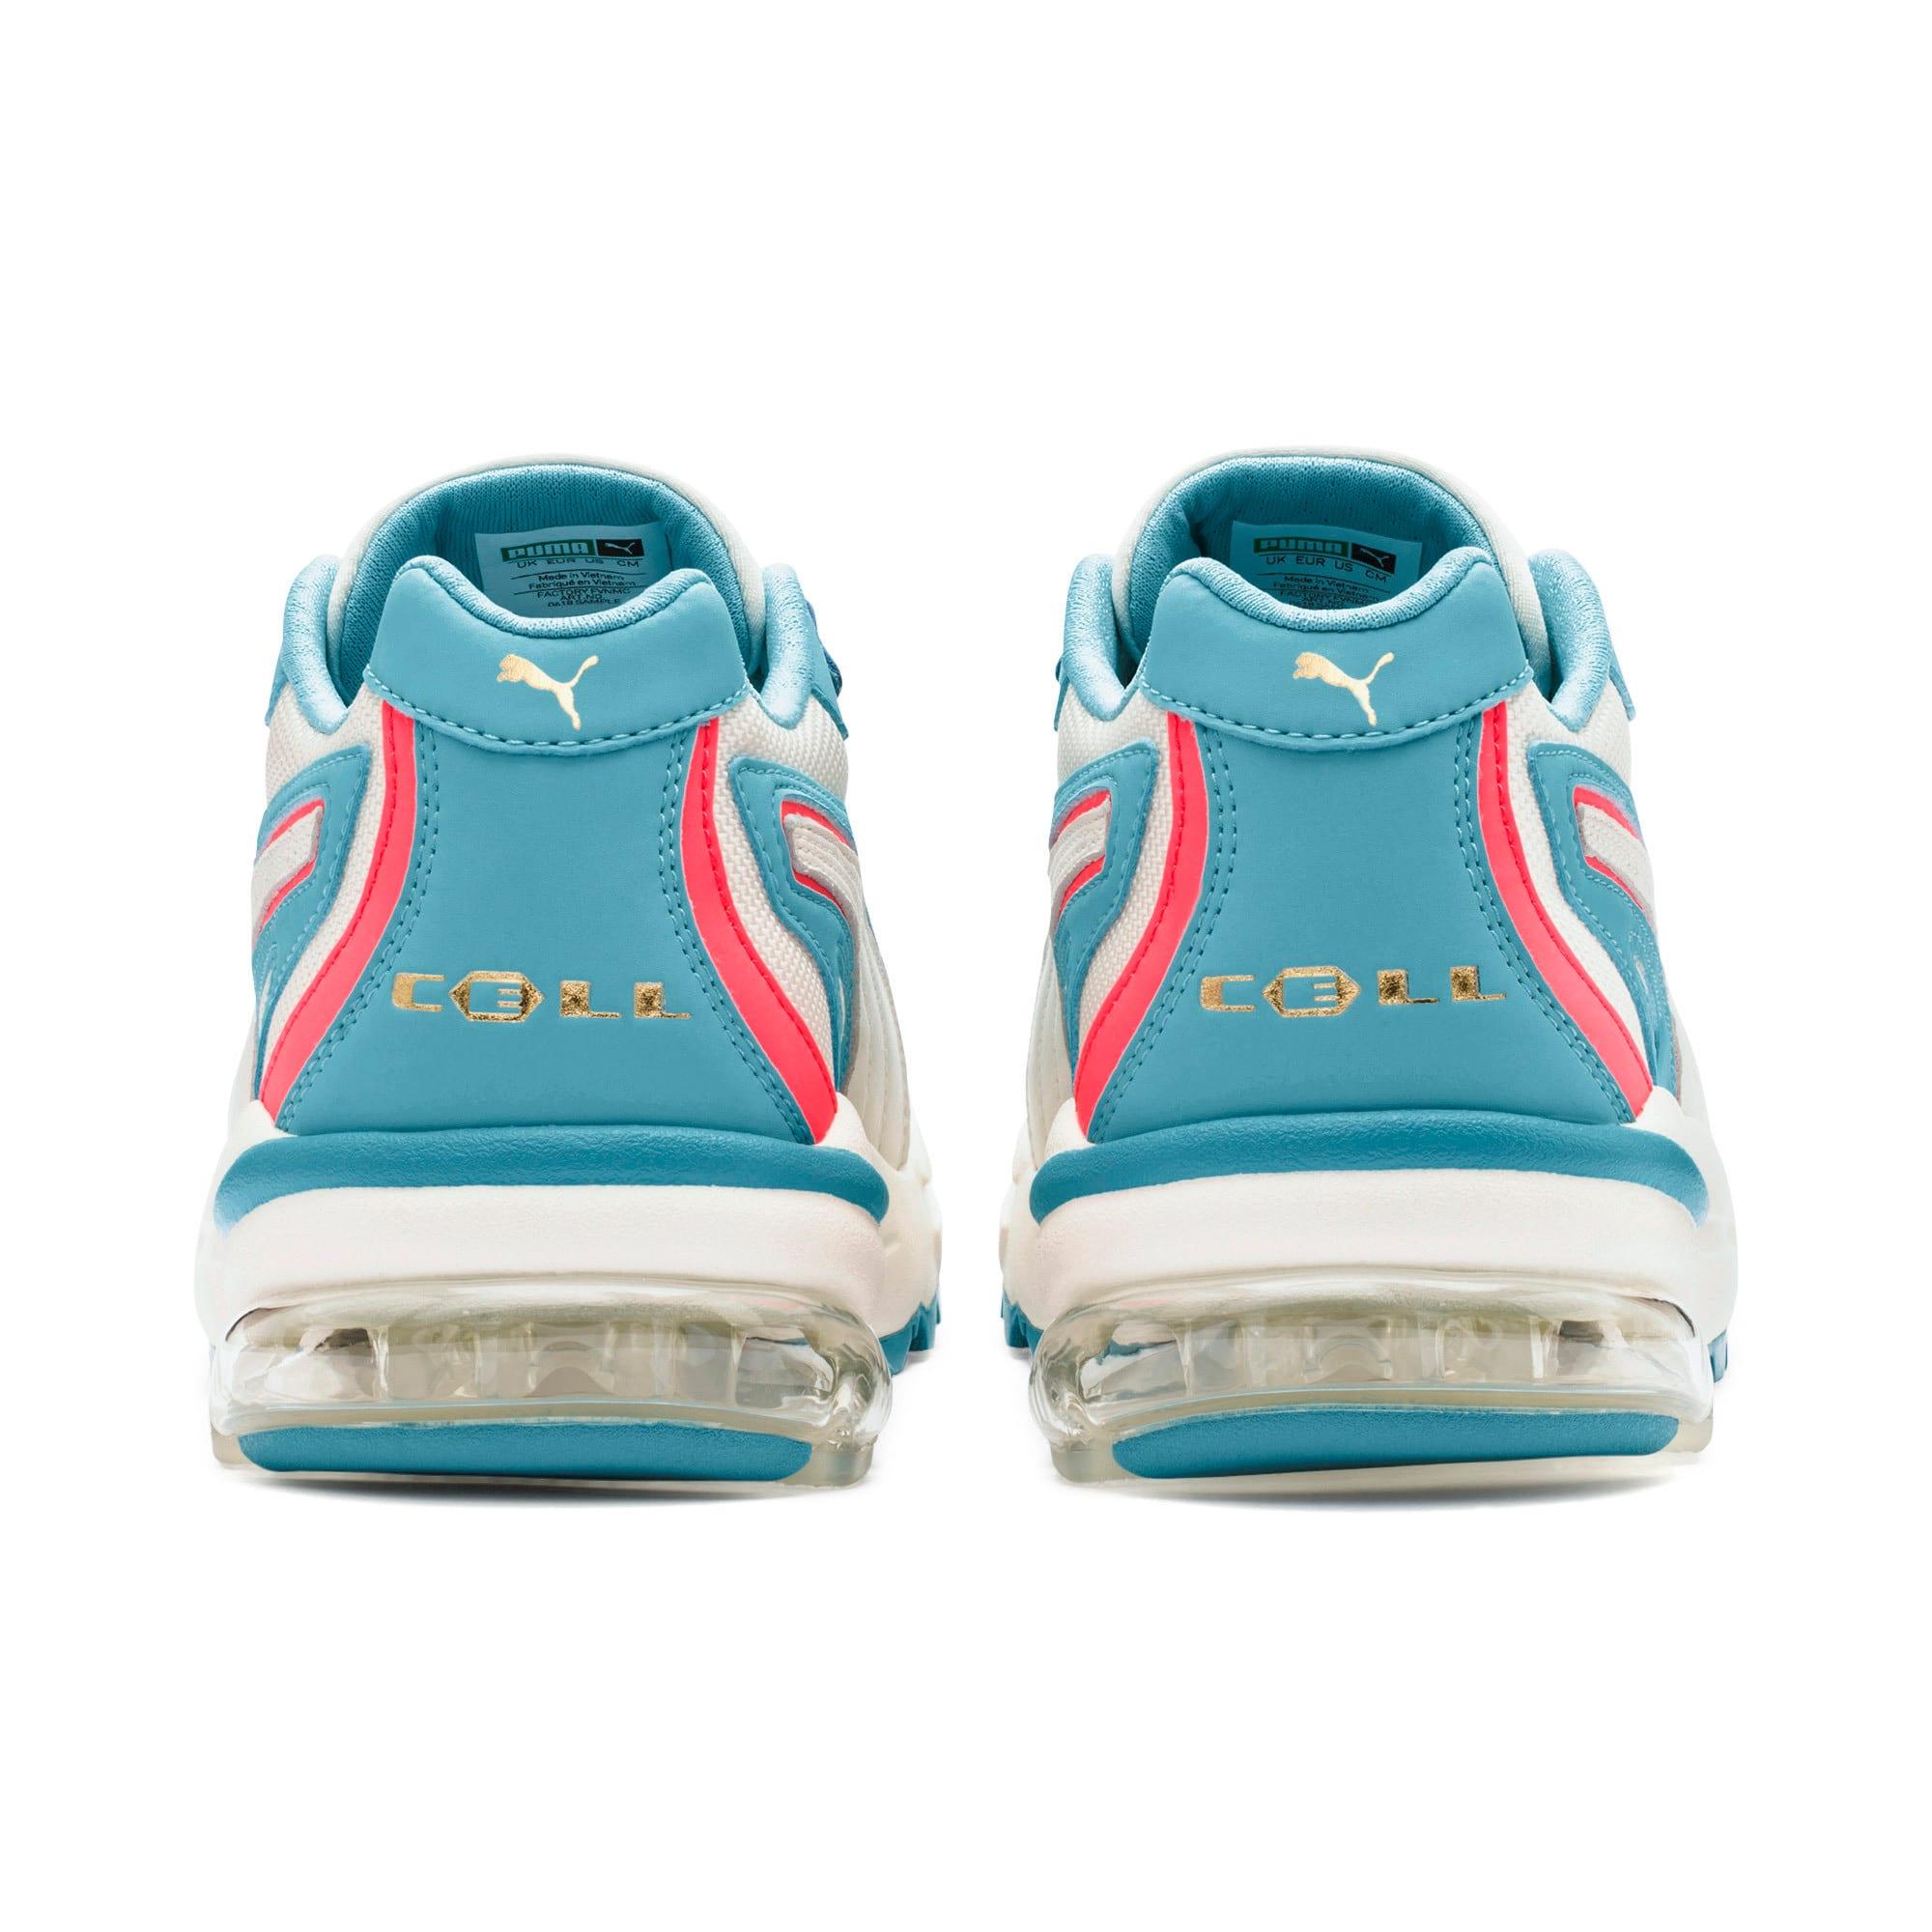 Miniatura 4 de Zapatos deportivos CELL Stellar para mujer, Milky Blue-Puma Team Gold, mediano